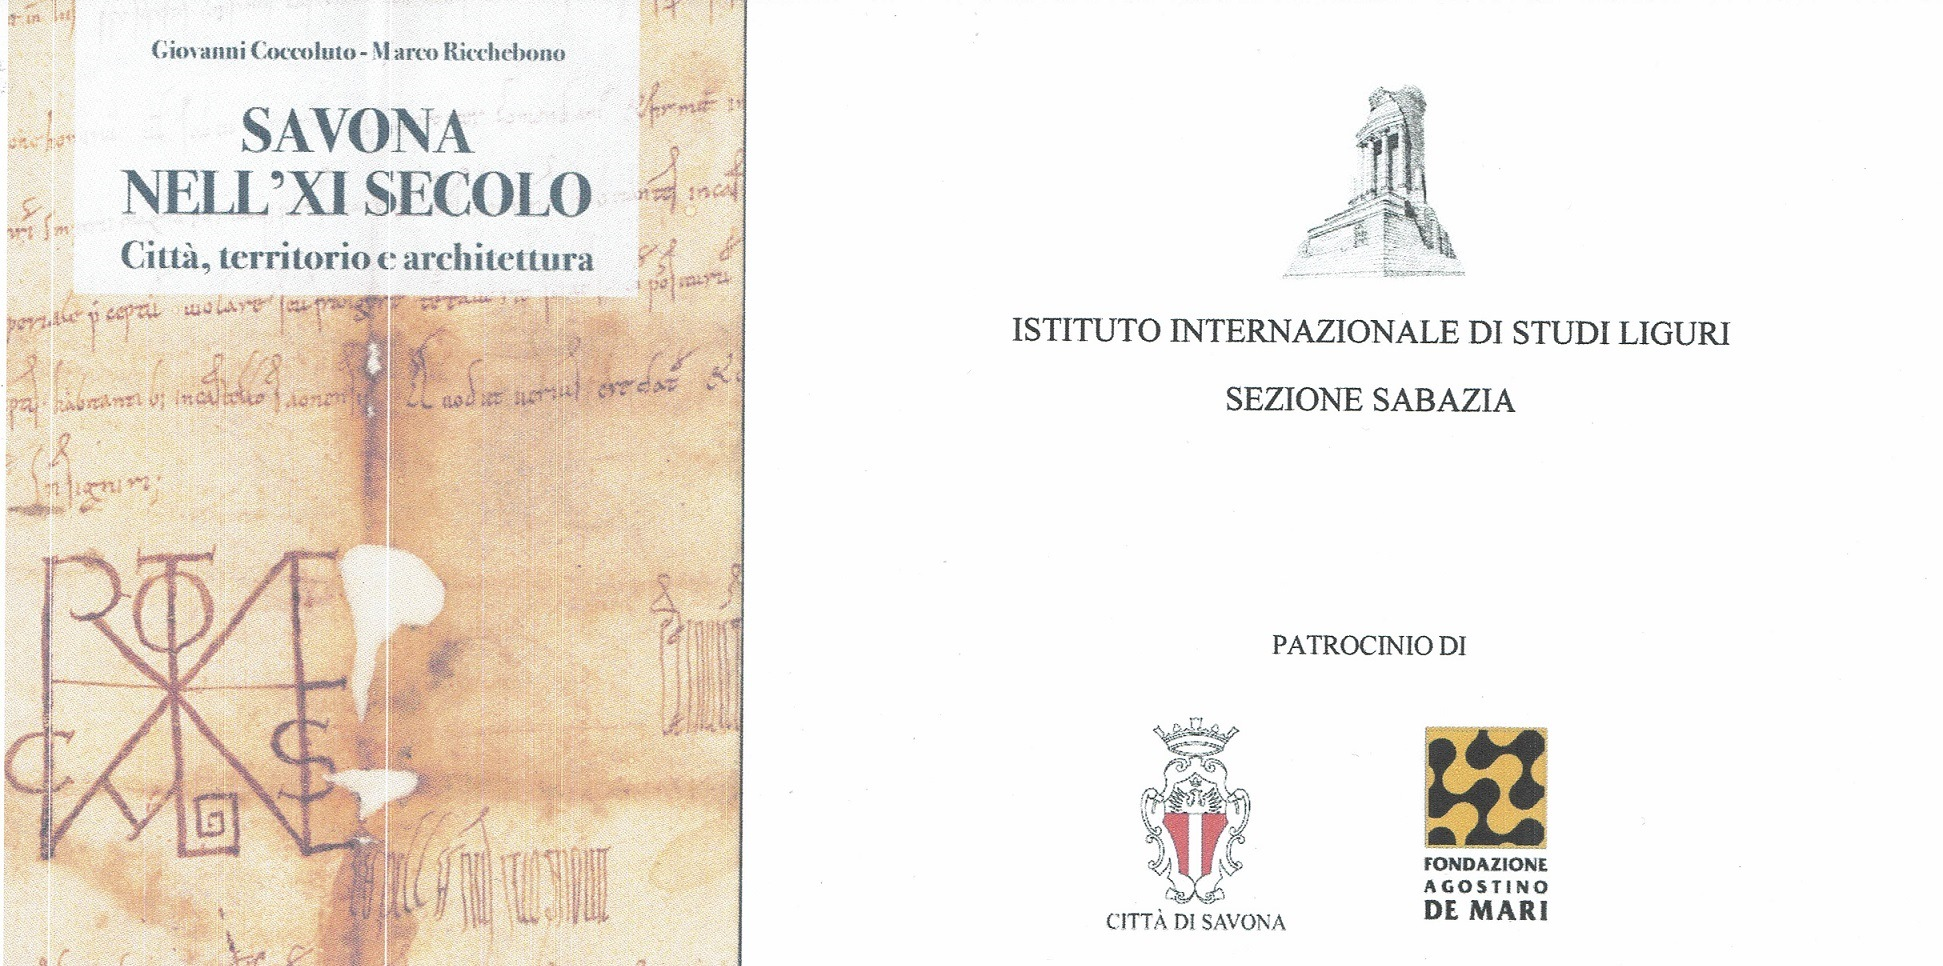 Architetti Savona Elenco civico museo archeologico savona